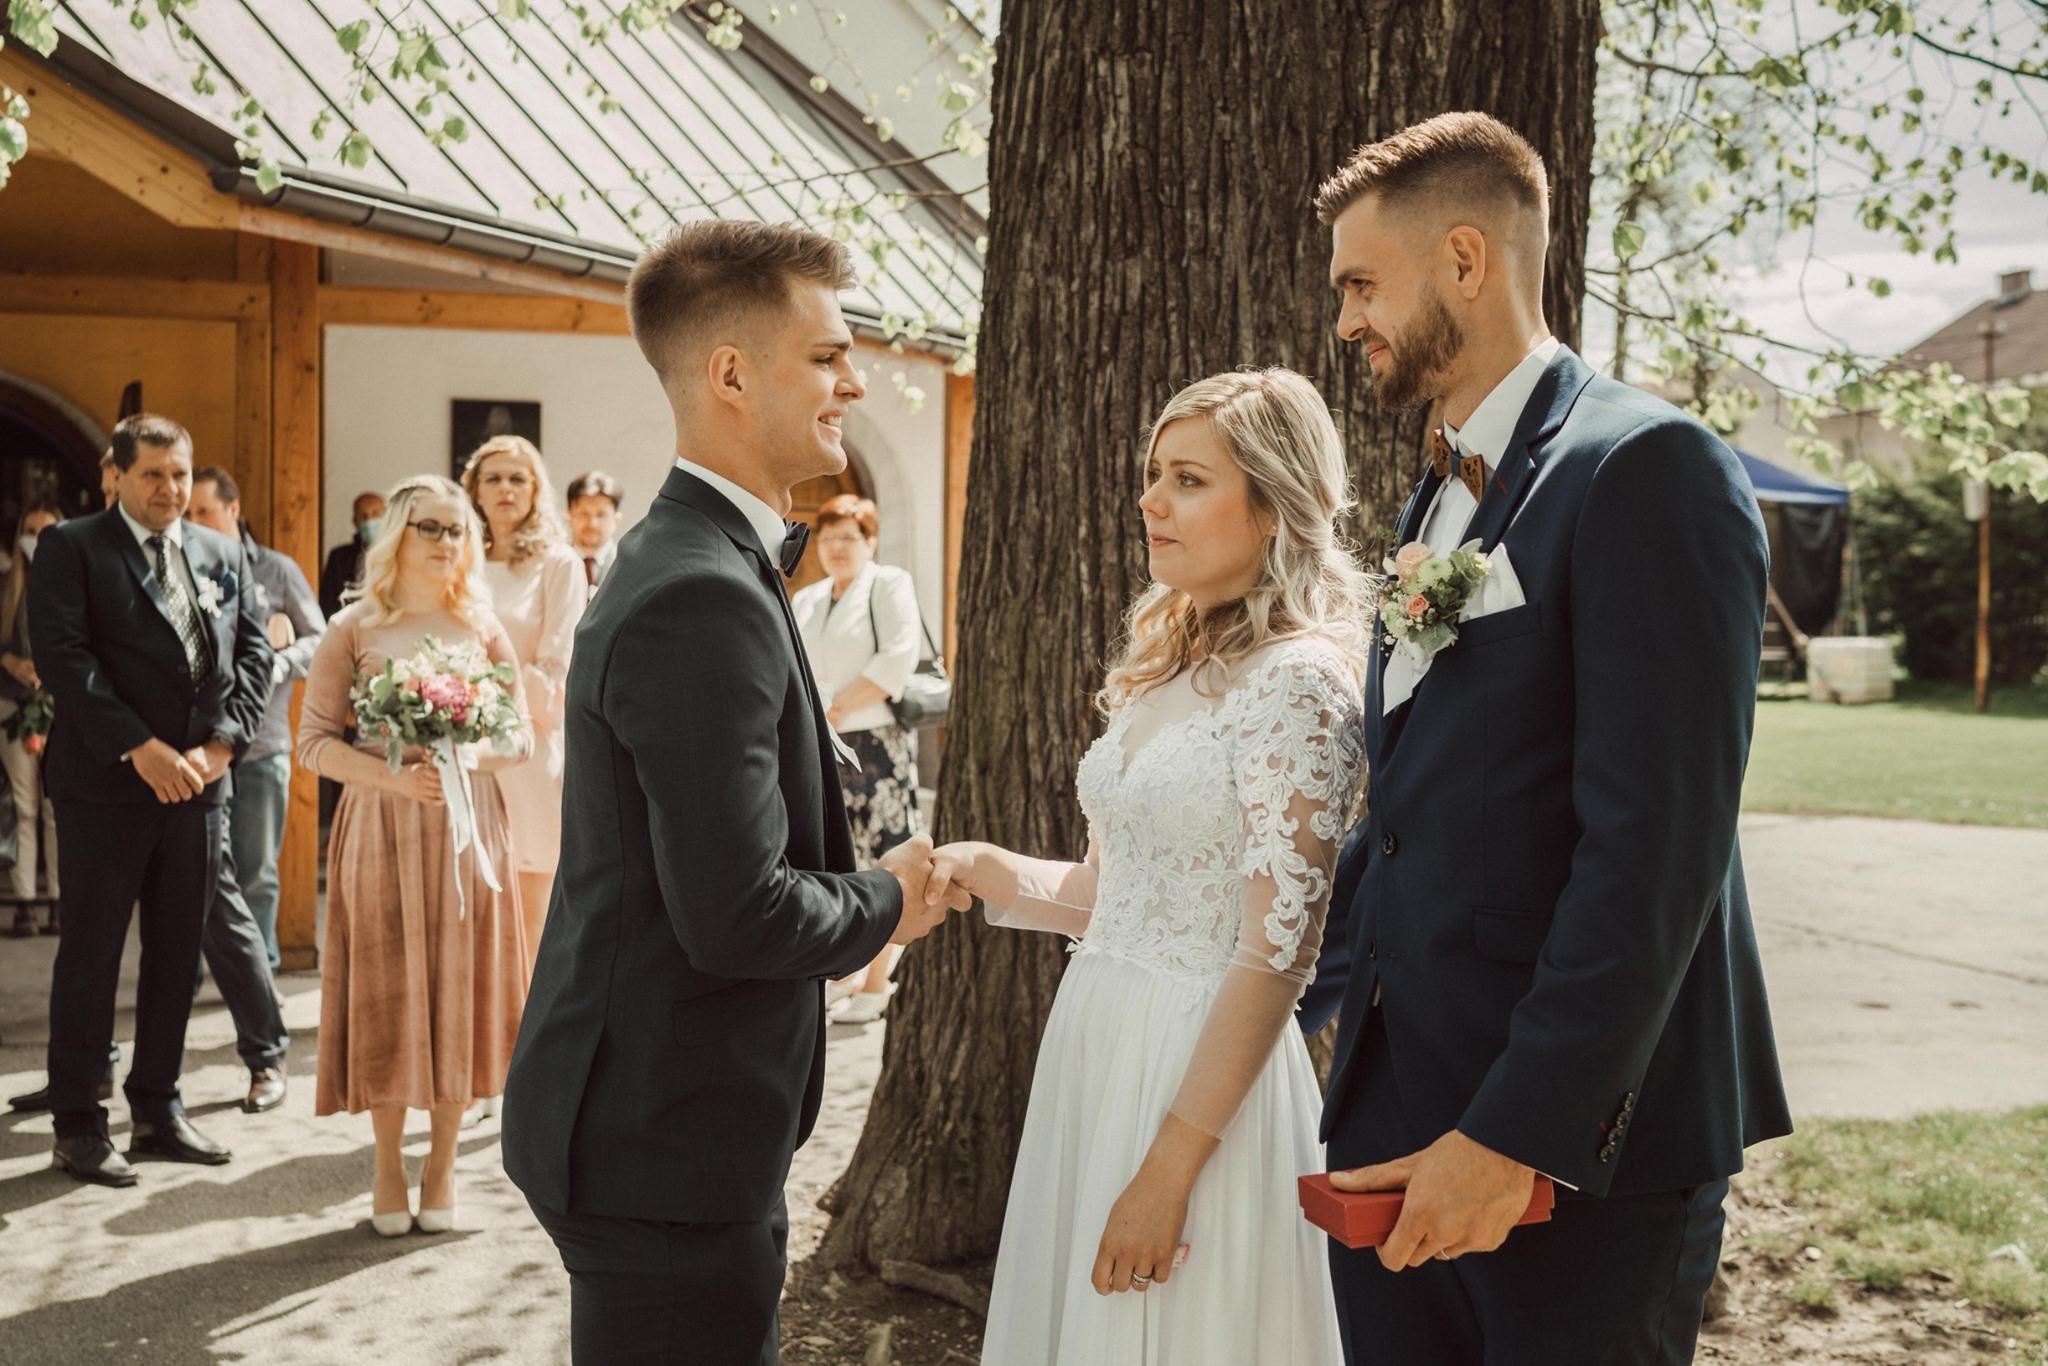 svadobne-gratulaciejpg